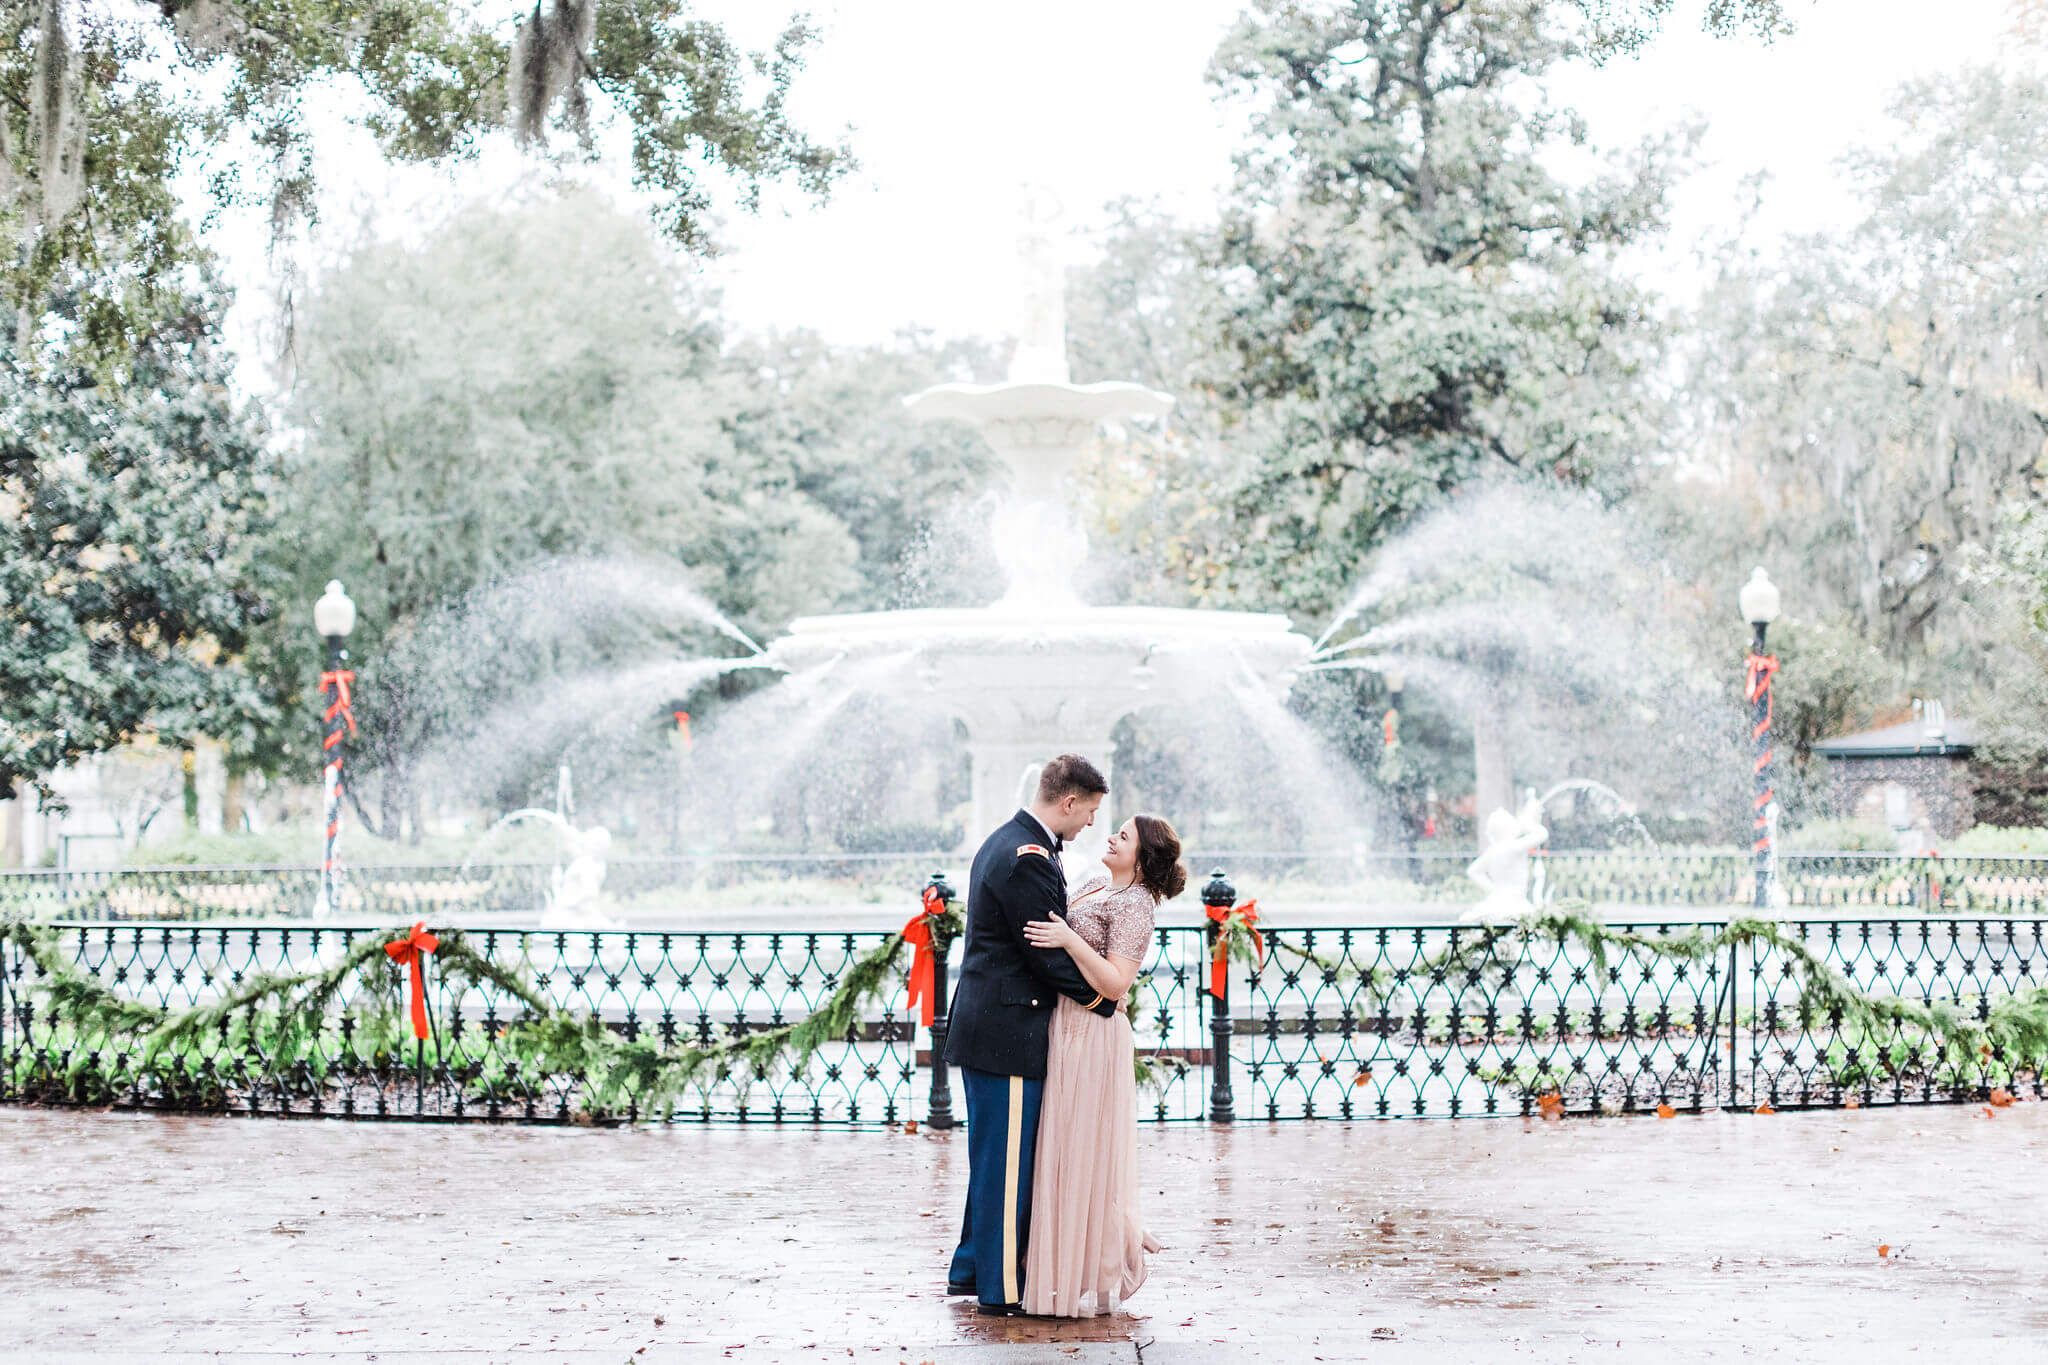 Apt-b-photography-savannah-engagement-photographer-savannah-wedding-hilton-head-elopement-savannah-wedding-photographer-26.jpg